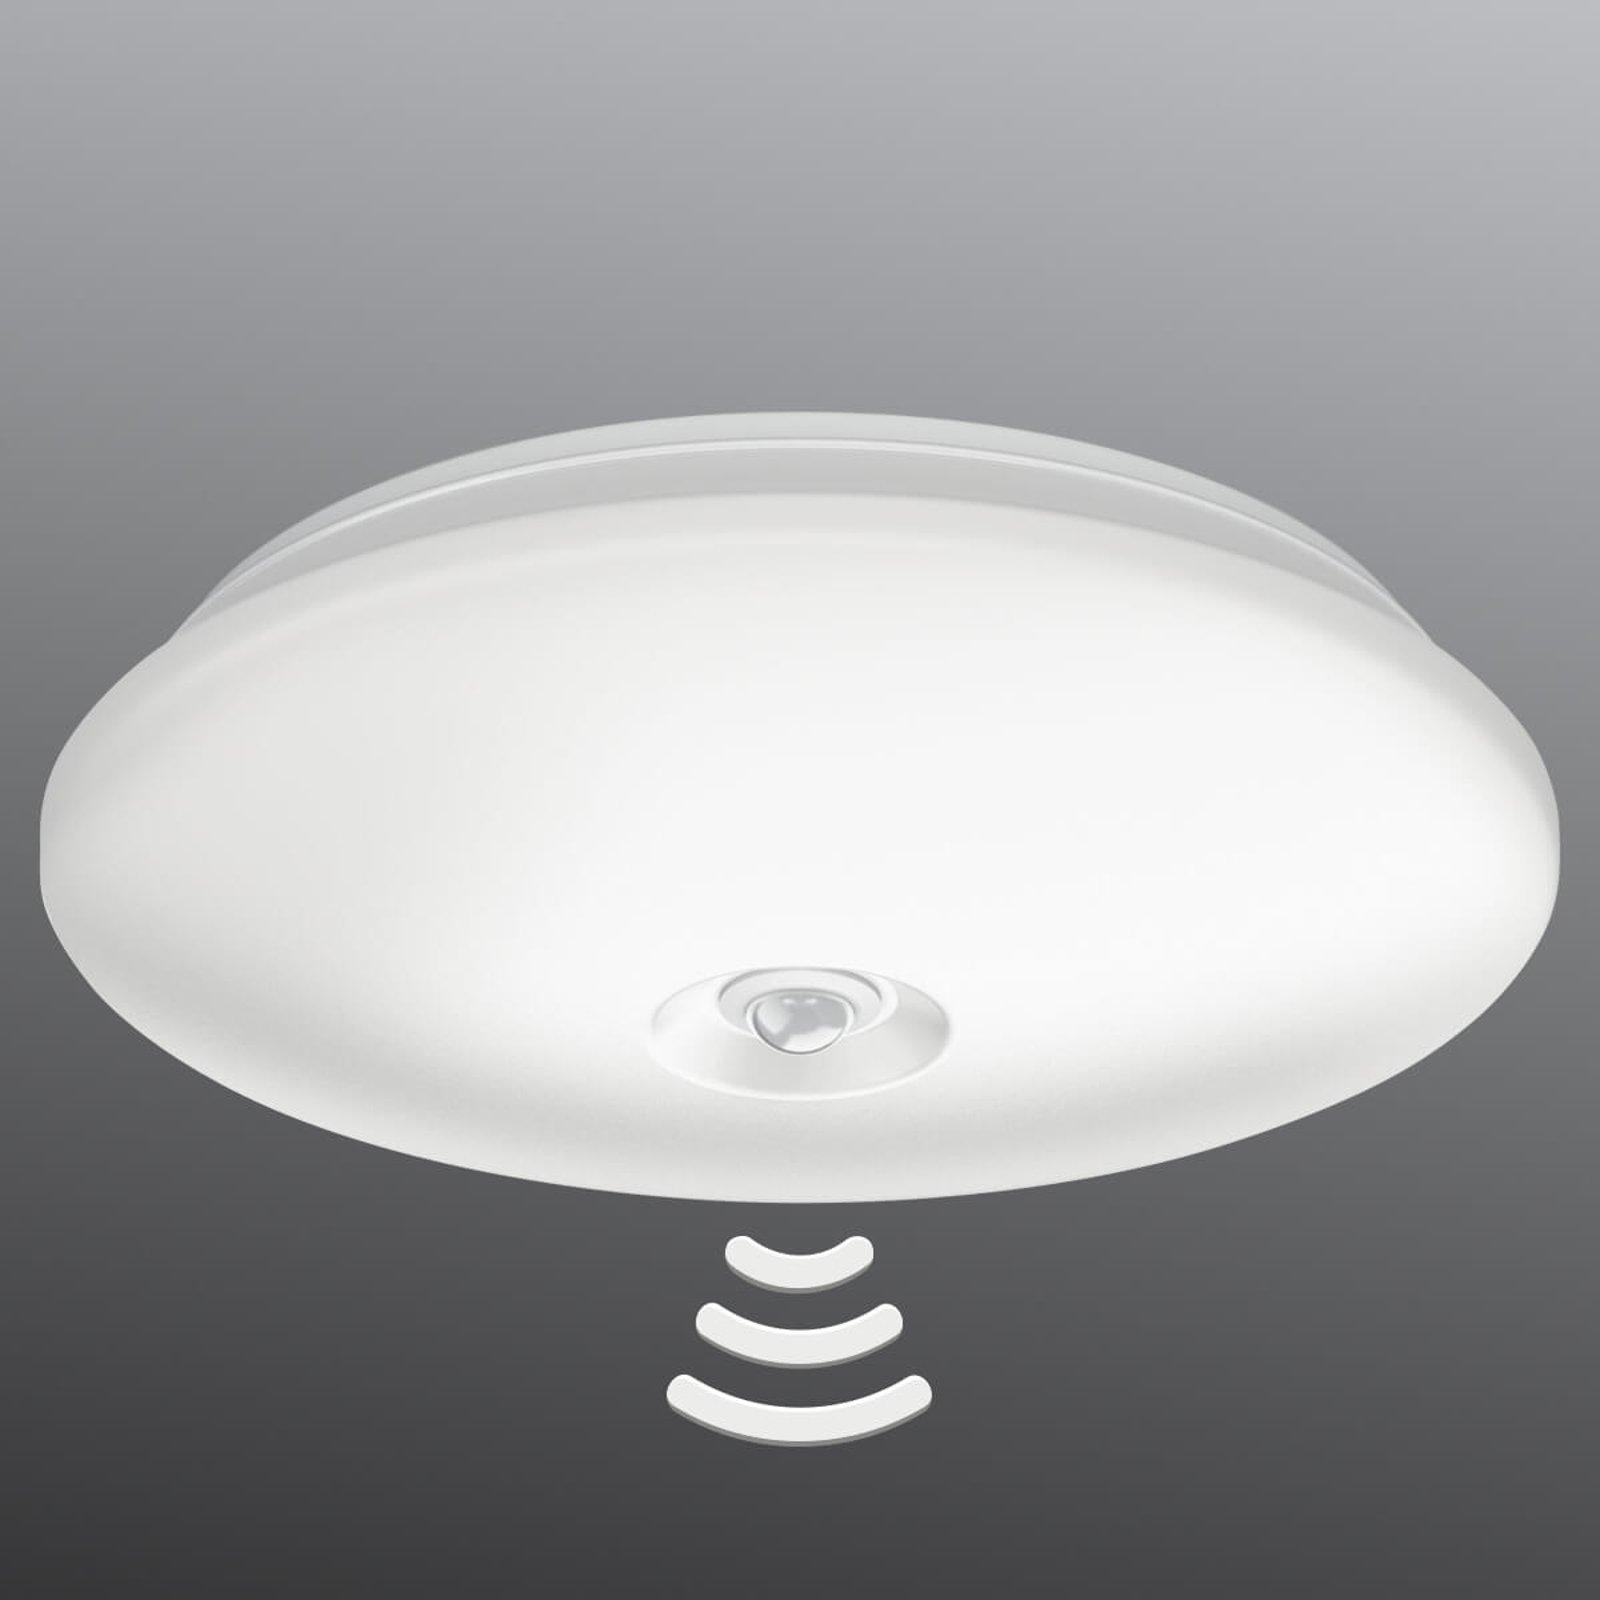 LED taklampe Mauve med IR-sensor, Ø 32 cm